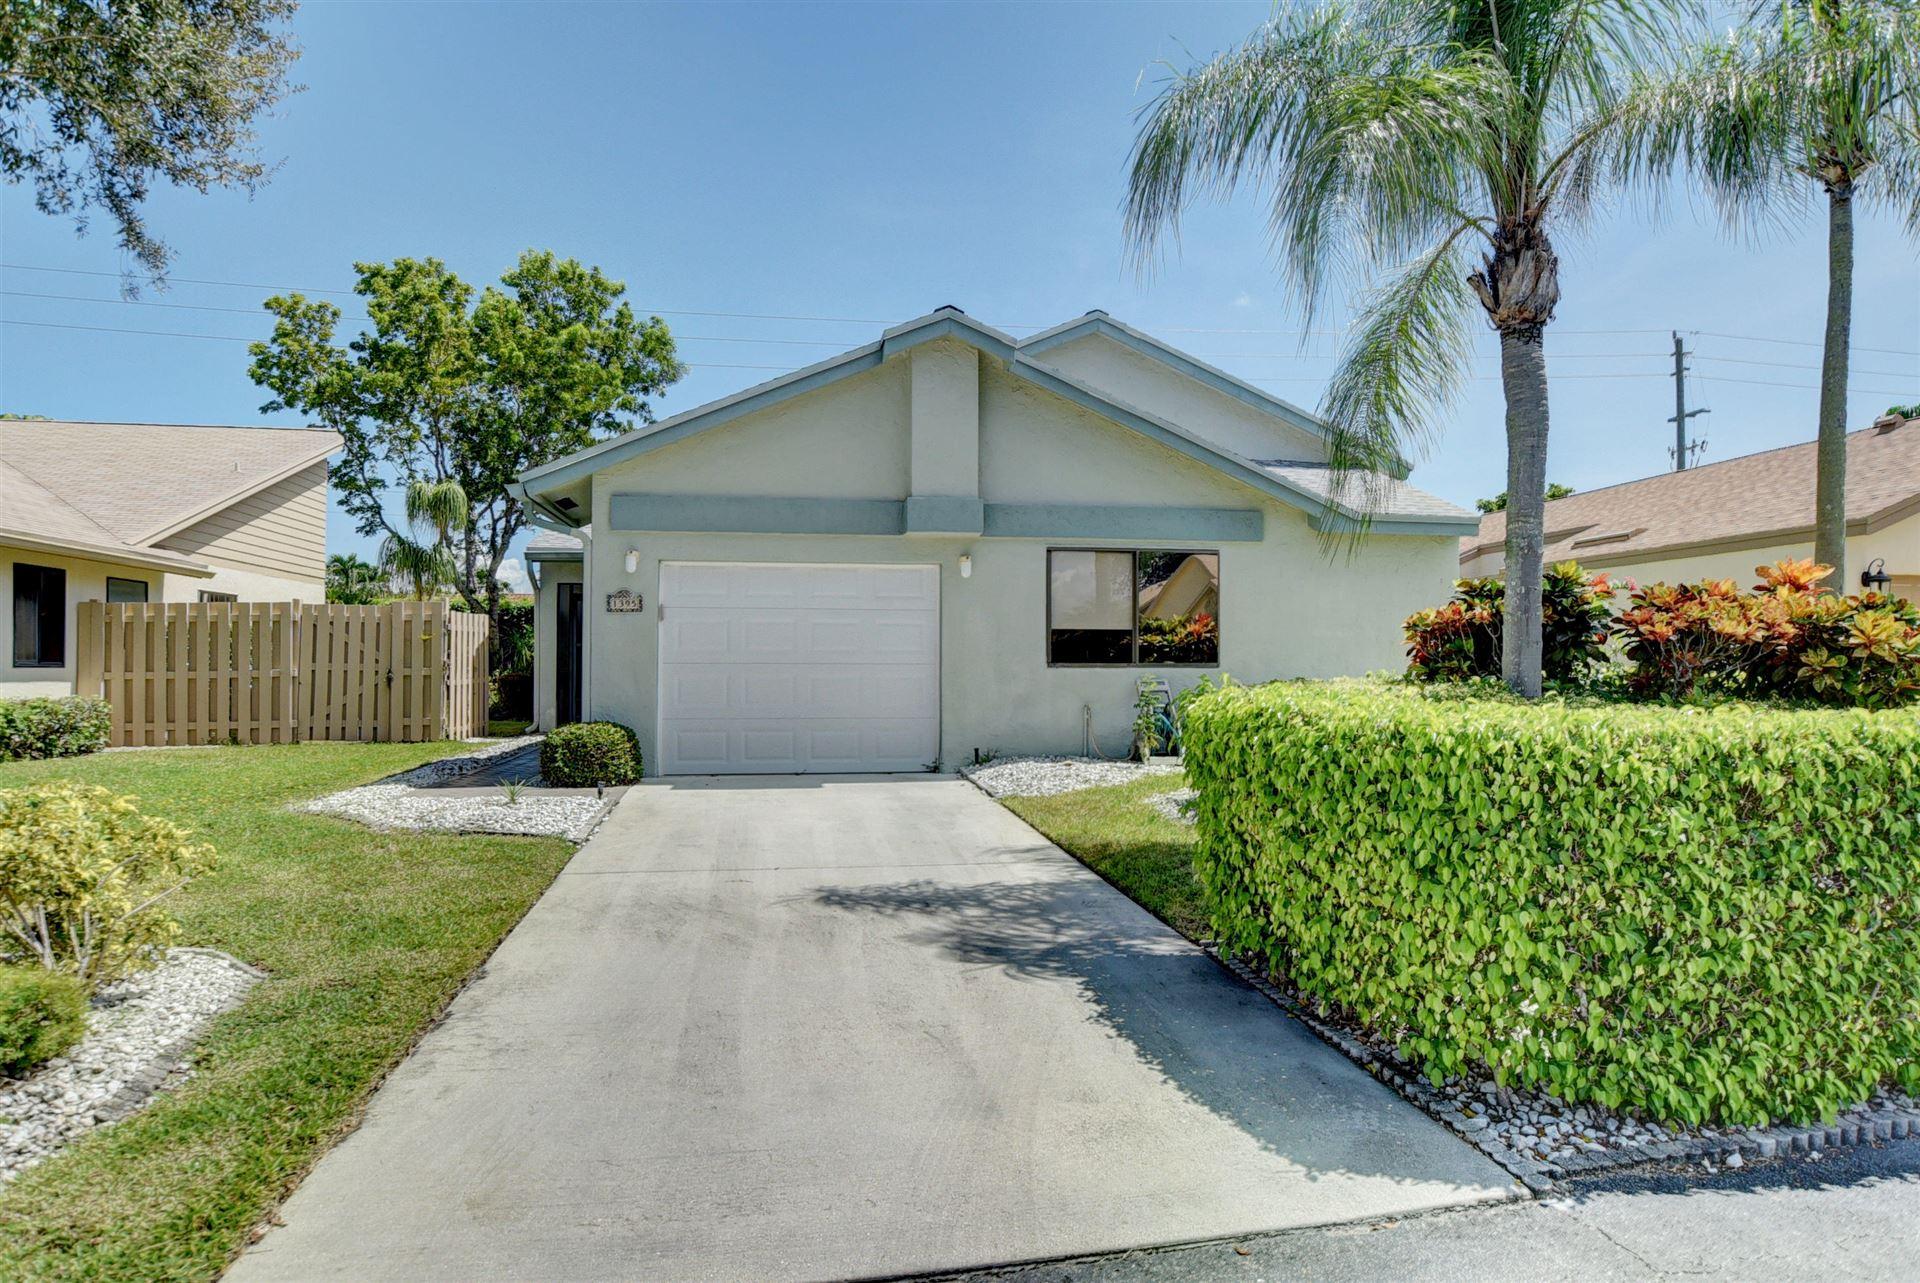 1395 NW 23rd Lane, Delray Beach, FL 33445 - #: RX-10655872